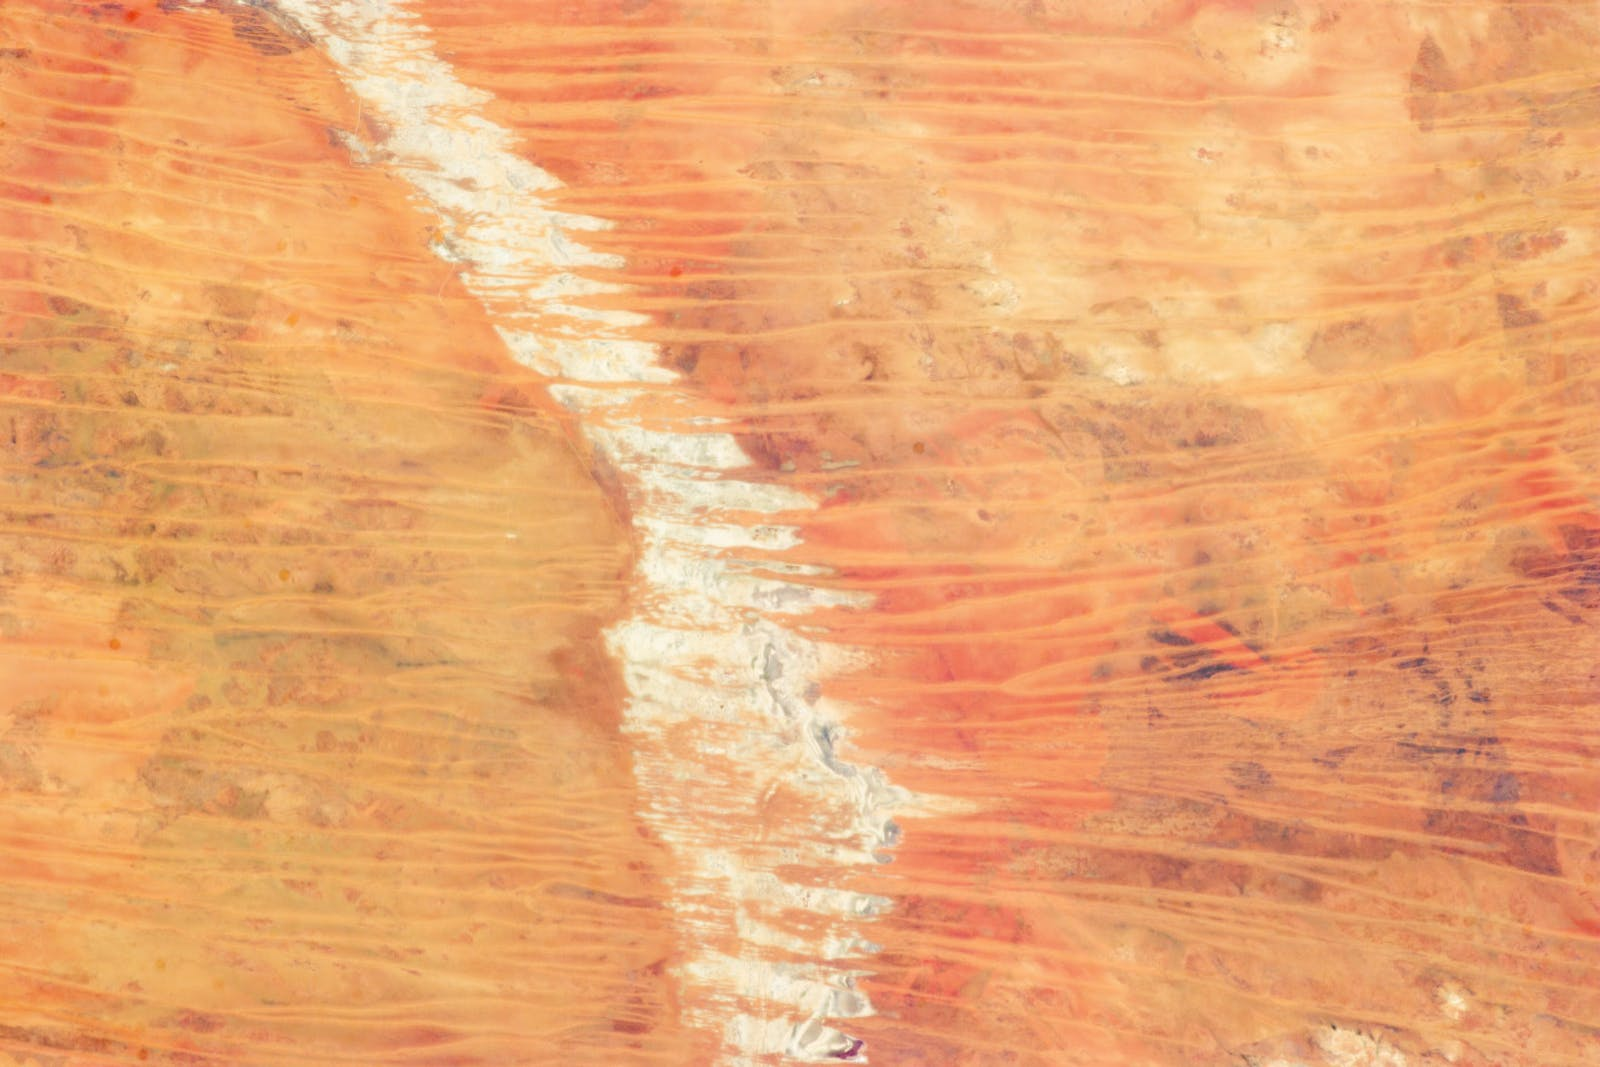 Great Sandy-Tanami Desert